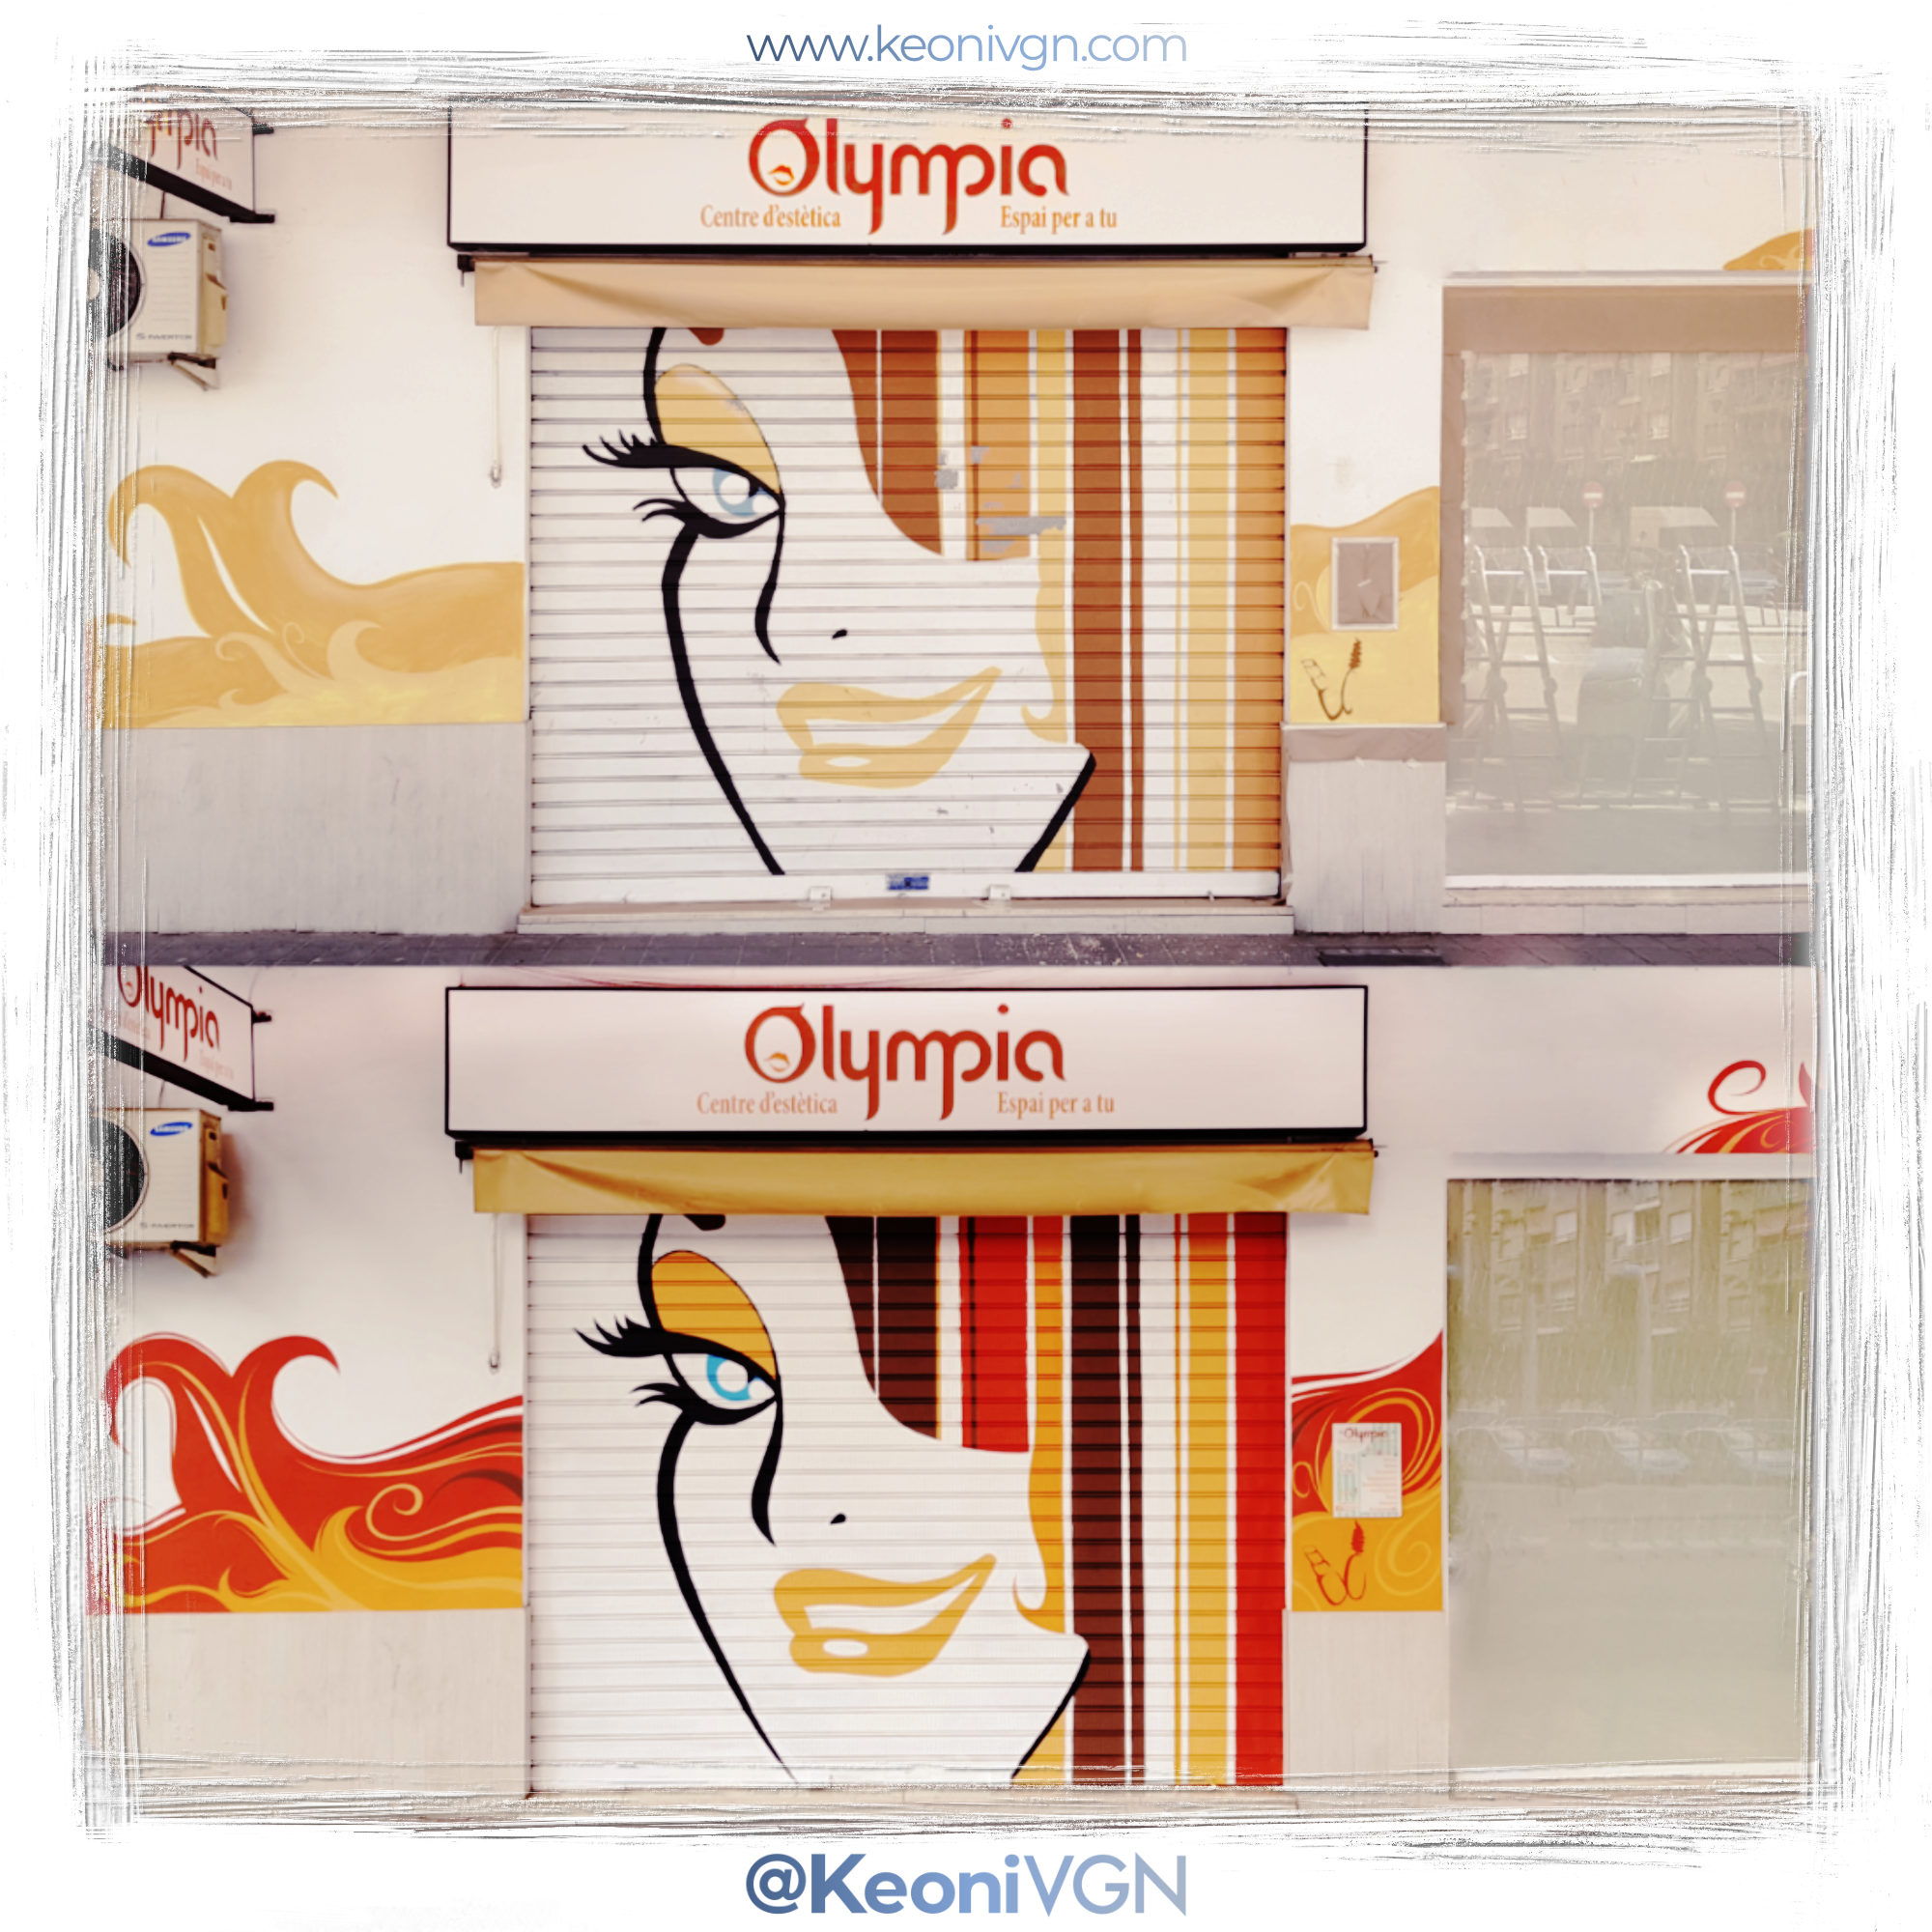 Mural Olympia C. de Estética